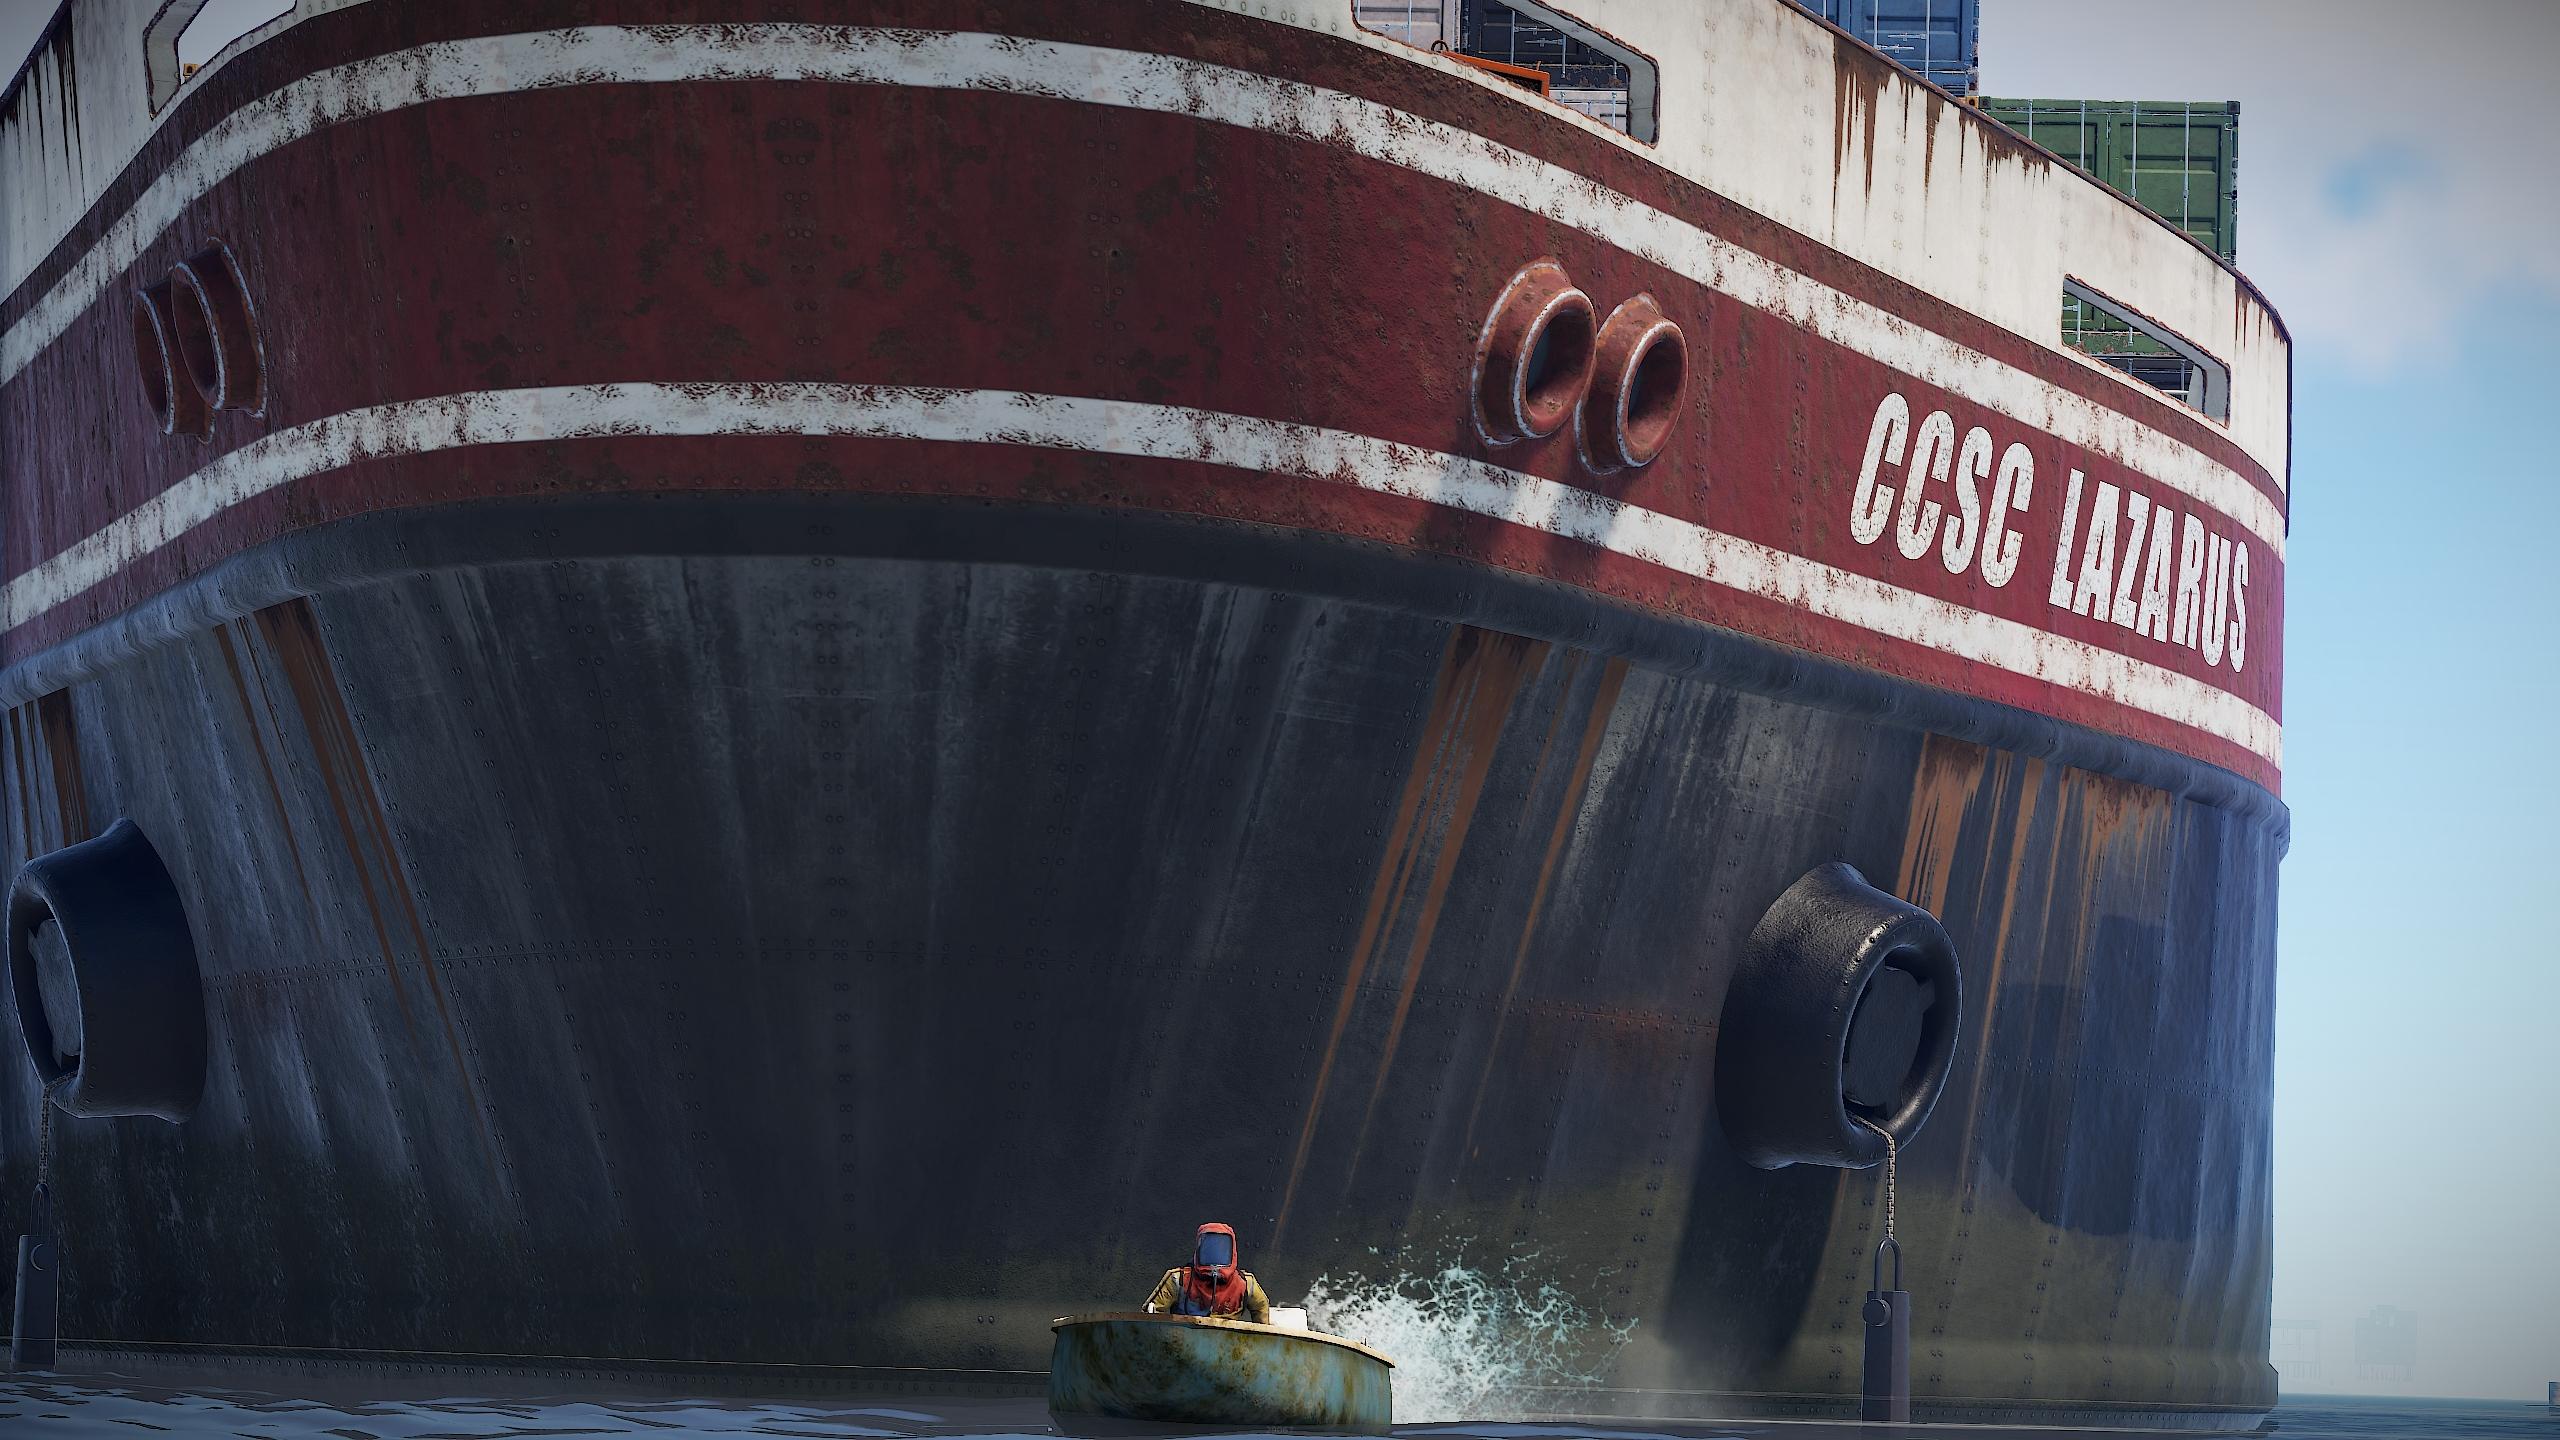 The_Cargo_Ship_Update_2.jpg